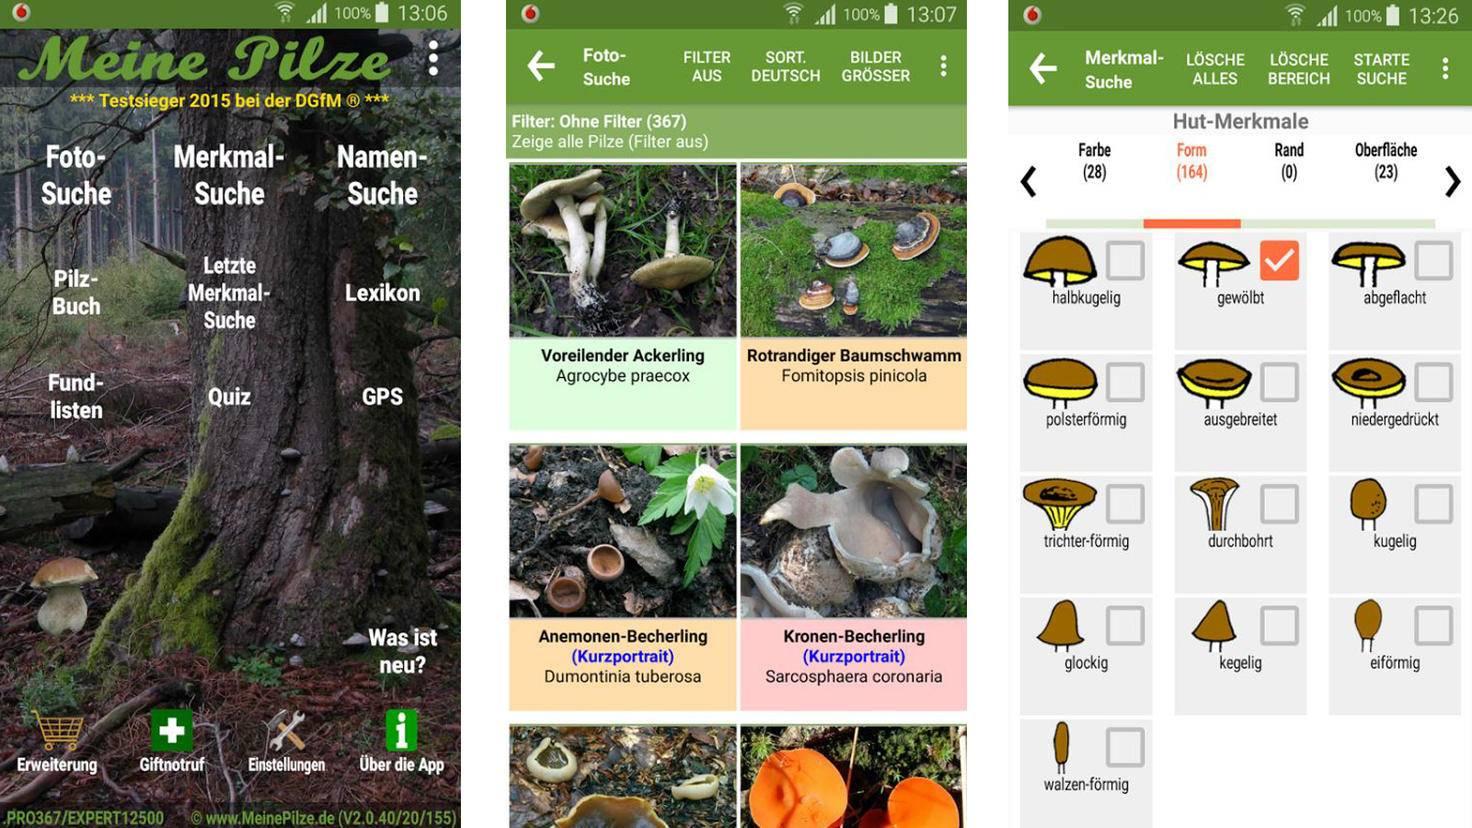 Meine Pilze-Google PlayStore-Meine Pilze